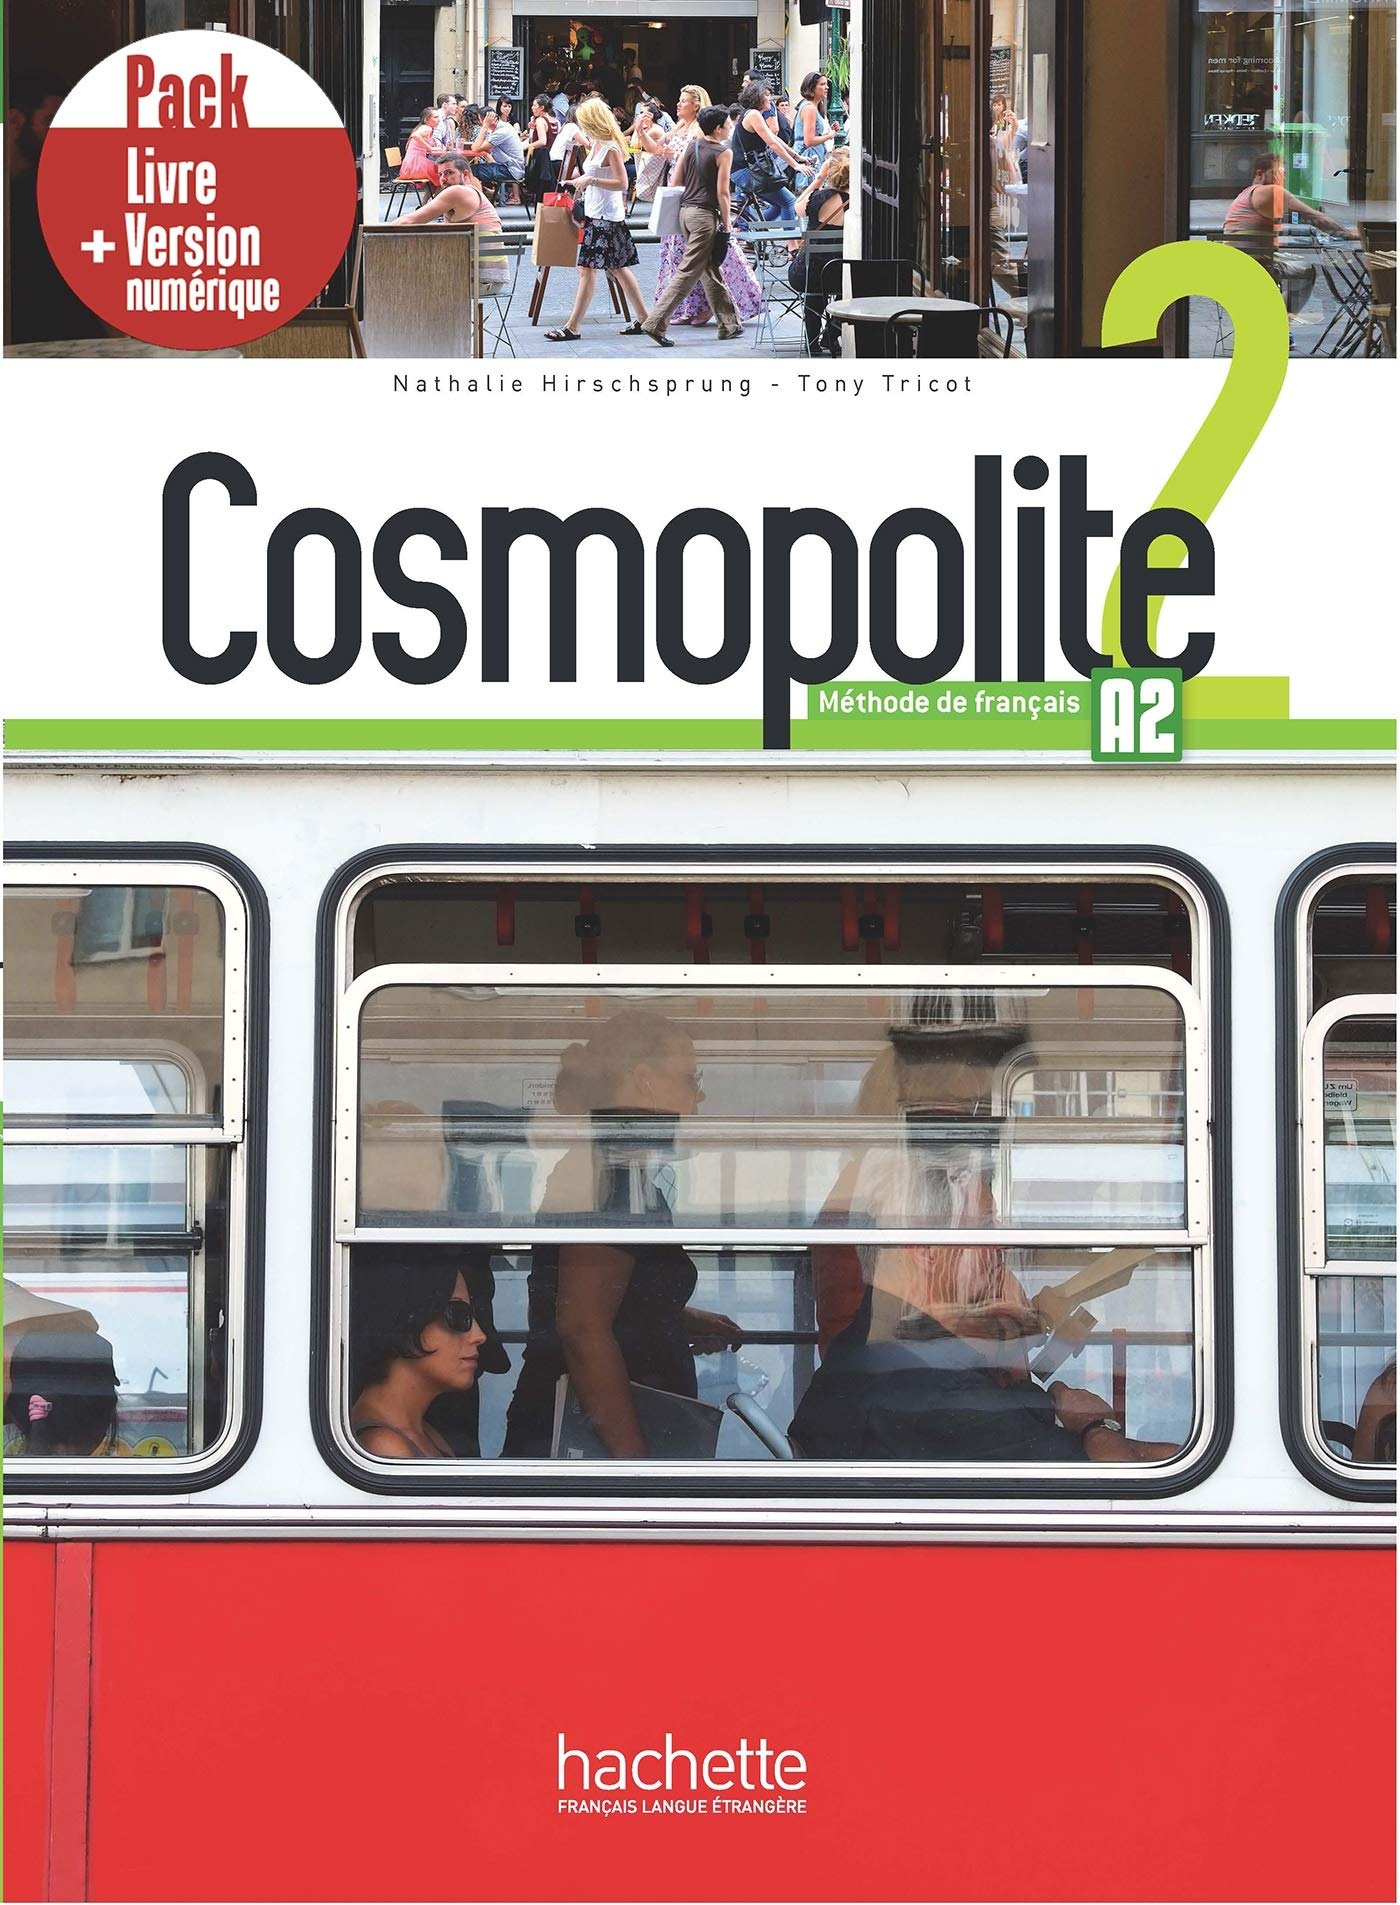 COSMOPOLITE 2 PACK LIVRE  VERSION NUMERIQUE